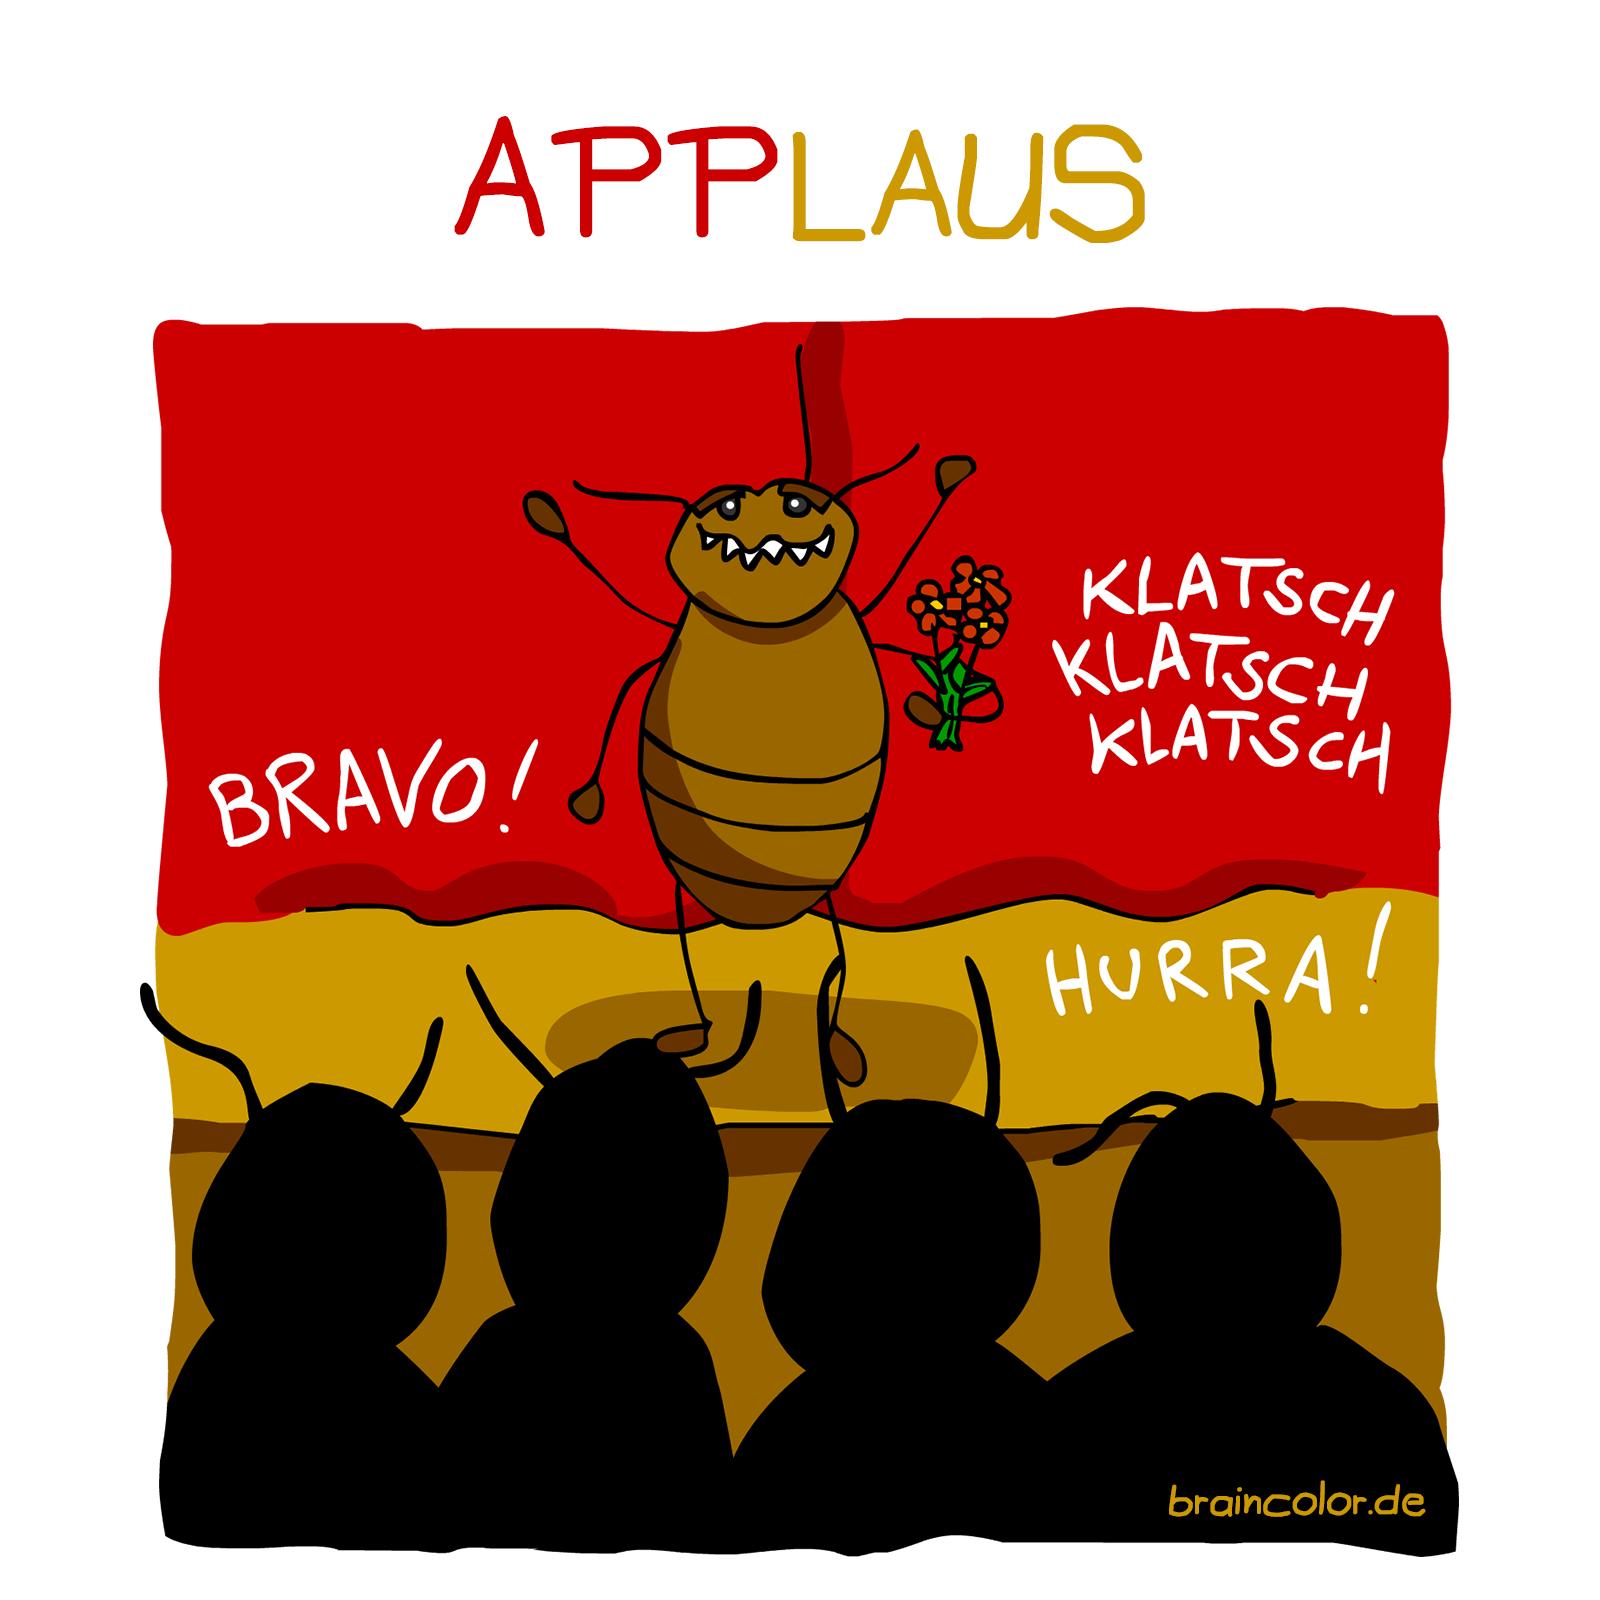 Applaus